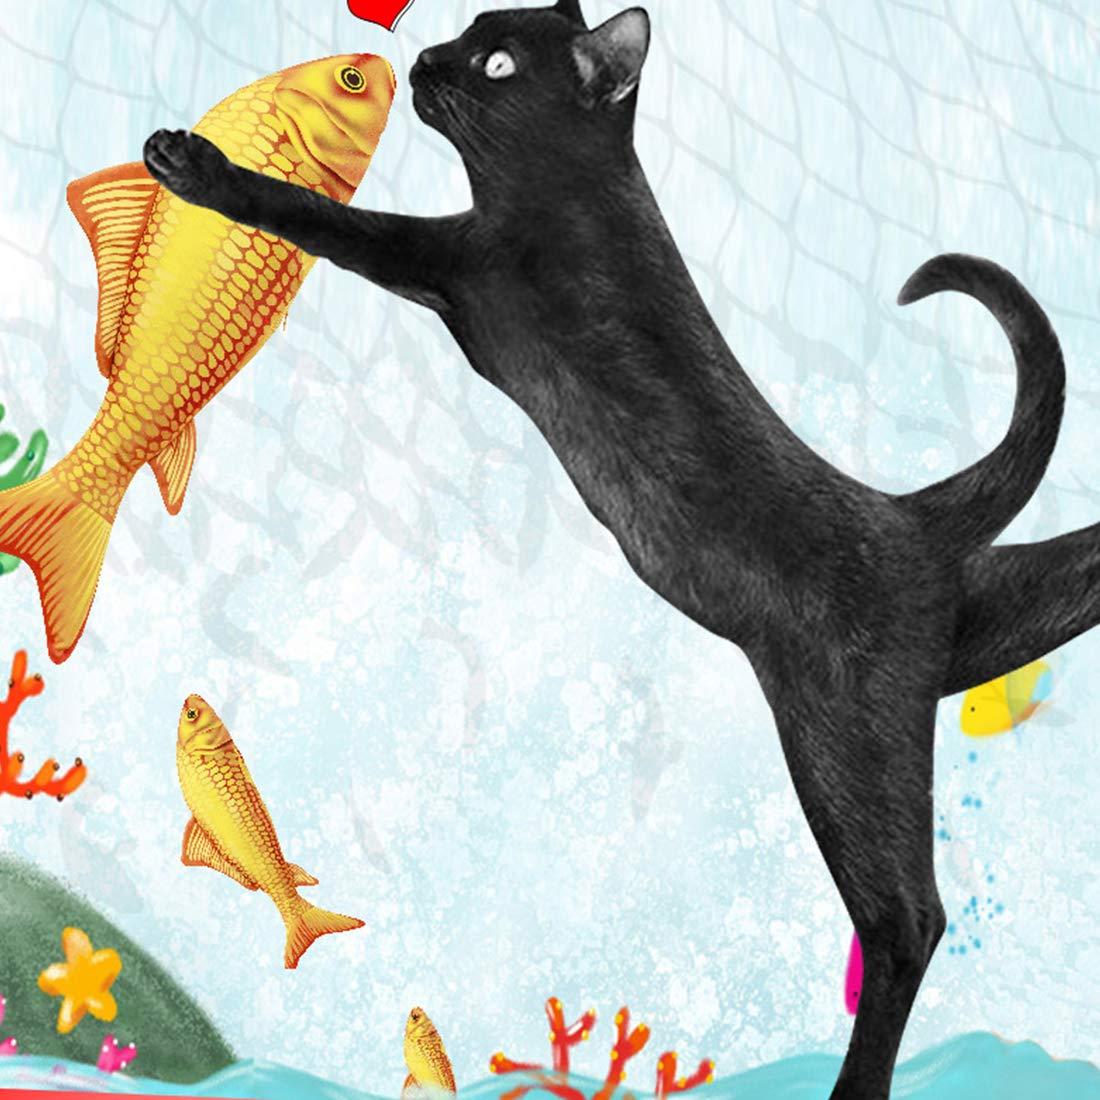 Hot Sale  1PC Creative Pet Cat Kitten Chewing Cat Toys Catnip Stuffed Fish Interactive Kitten Product Cat Supplies